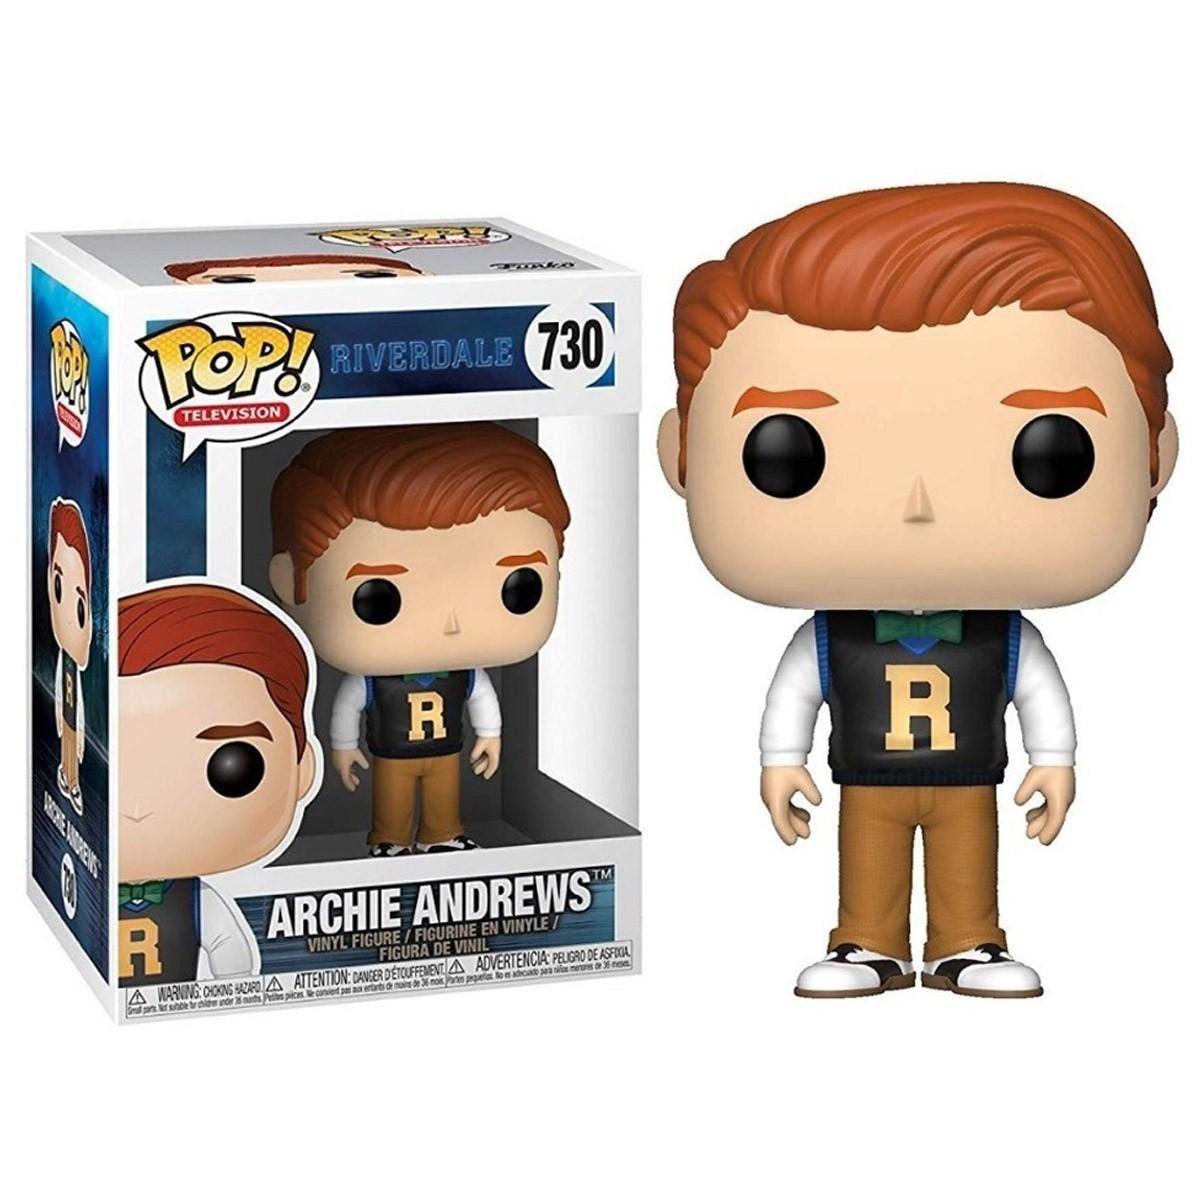 Funko Pop #730 - Archie Andrews - Riverdale  - Pop Funkos